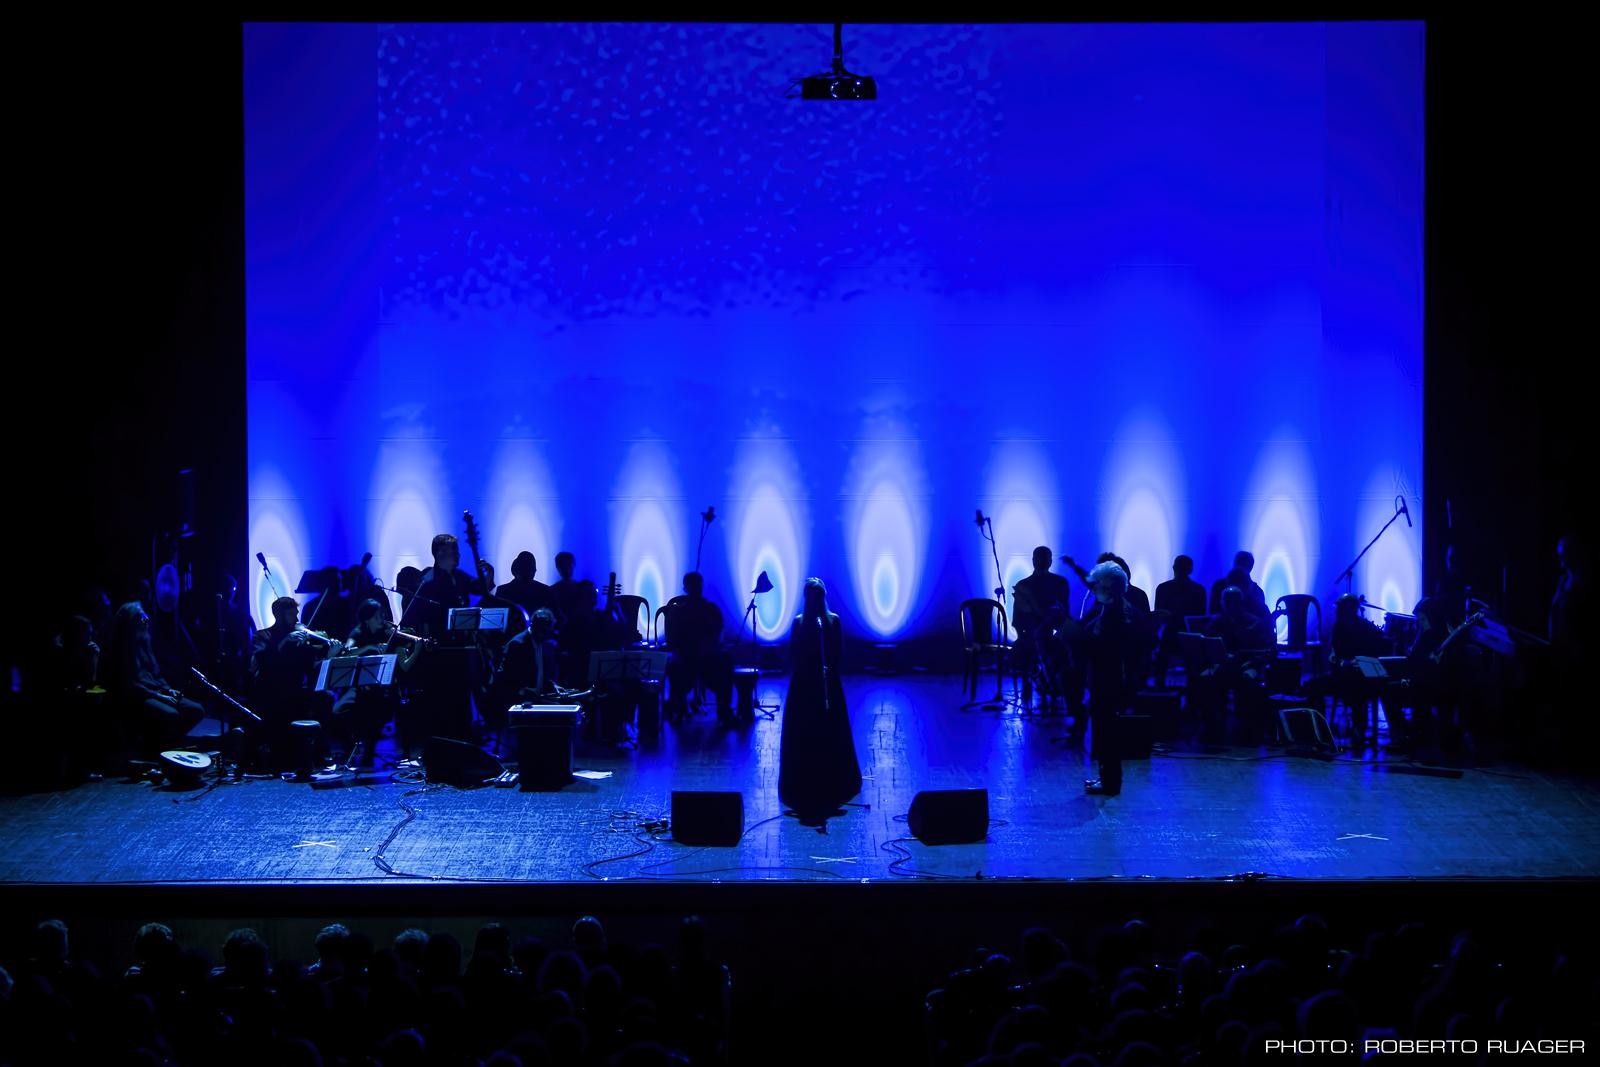 2014-11-11 - L'ISOLA IN-CANTATA - 008